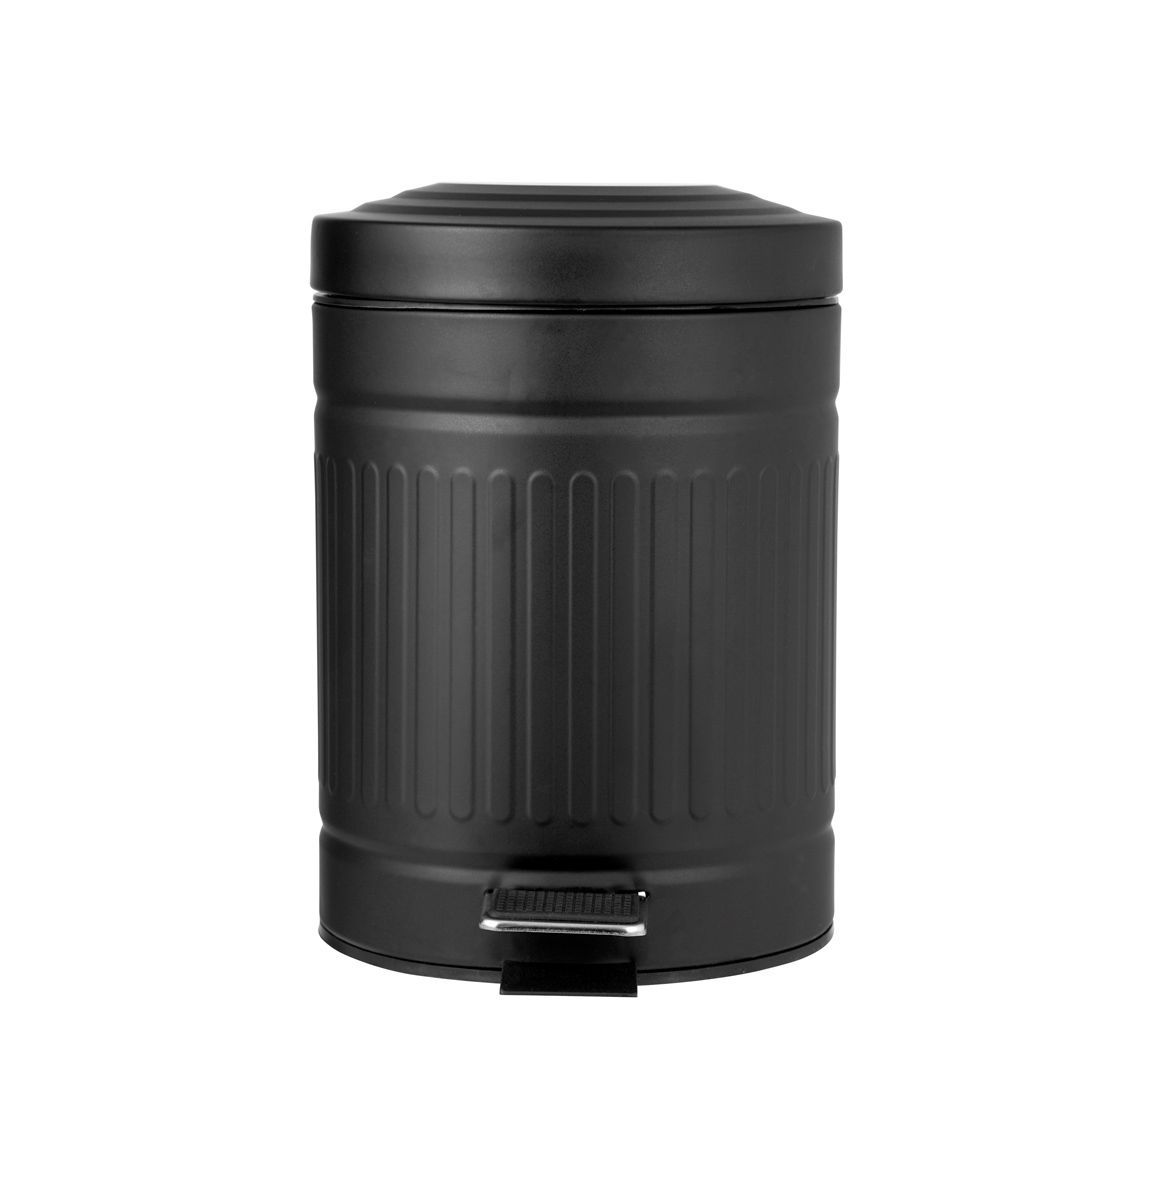 Prullenbak Carrie zwart - Badkameraccessoires - Badkamer :: Leeff ...